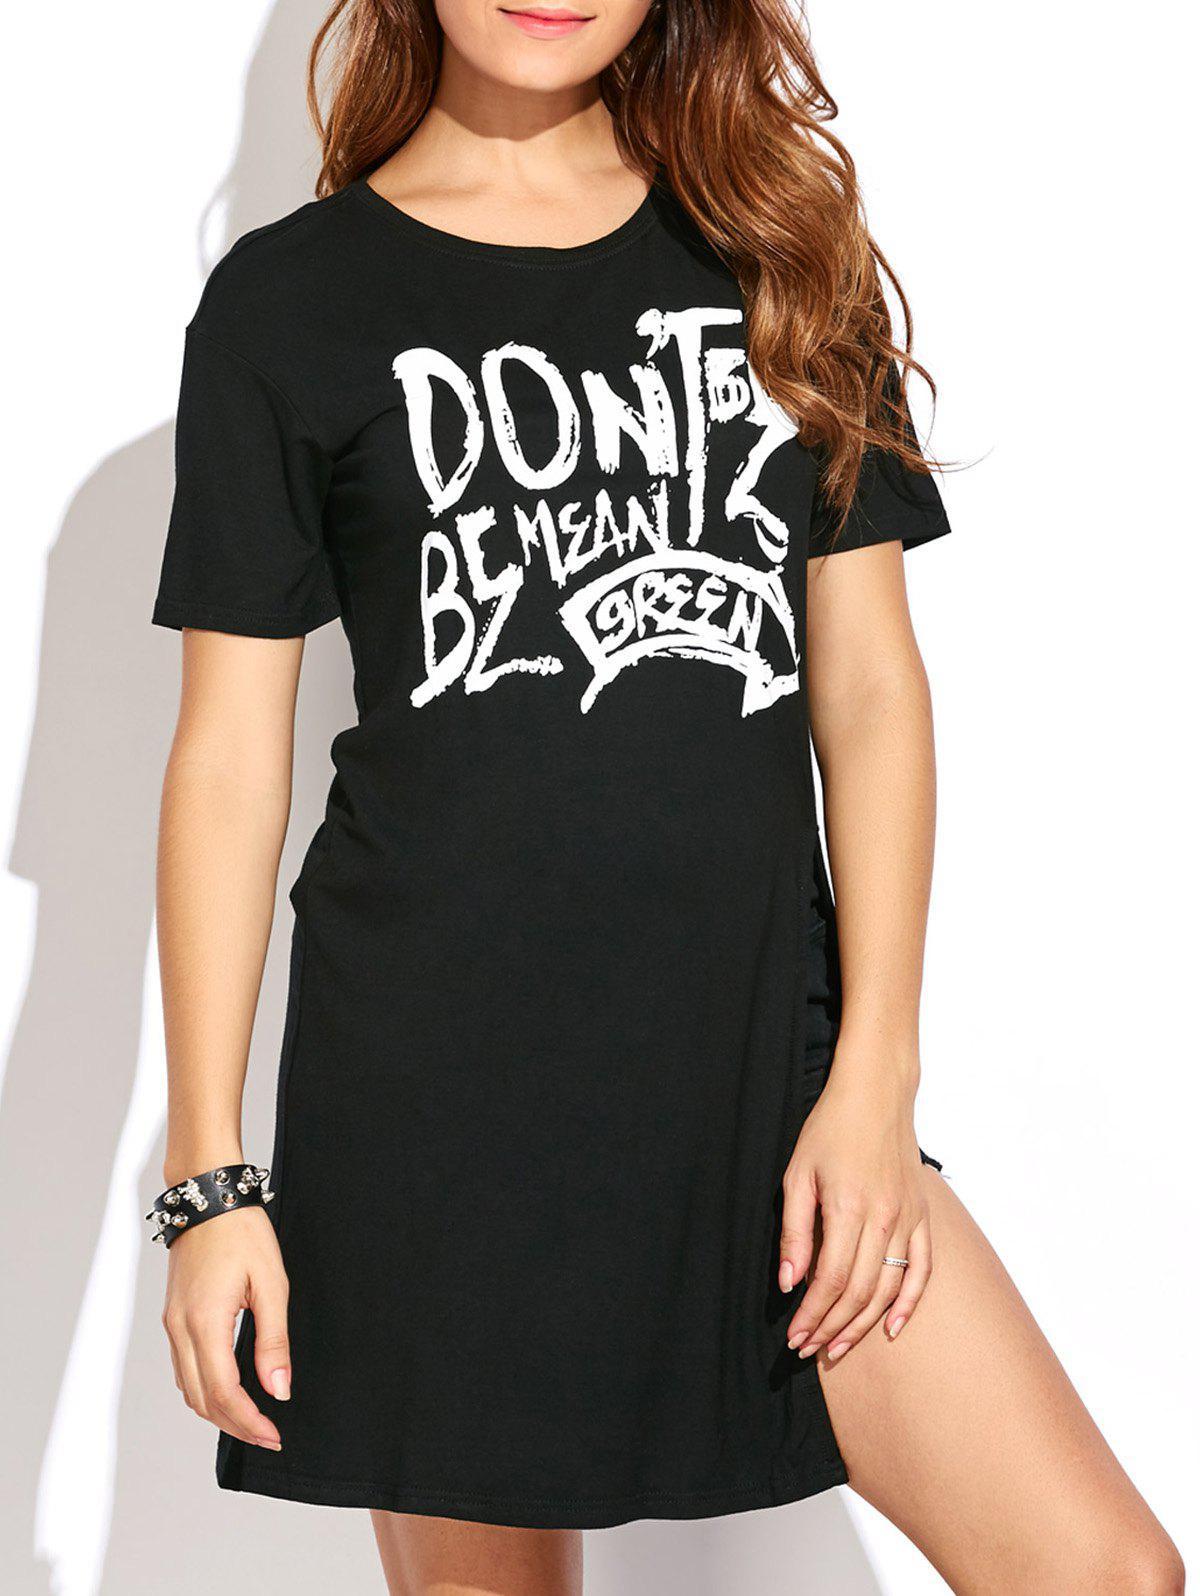 High Slit Graphic Long T Shirt 197831703